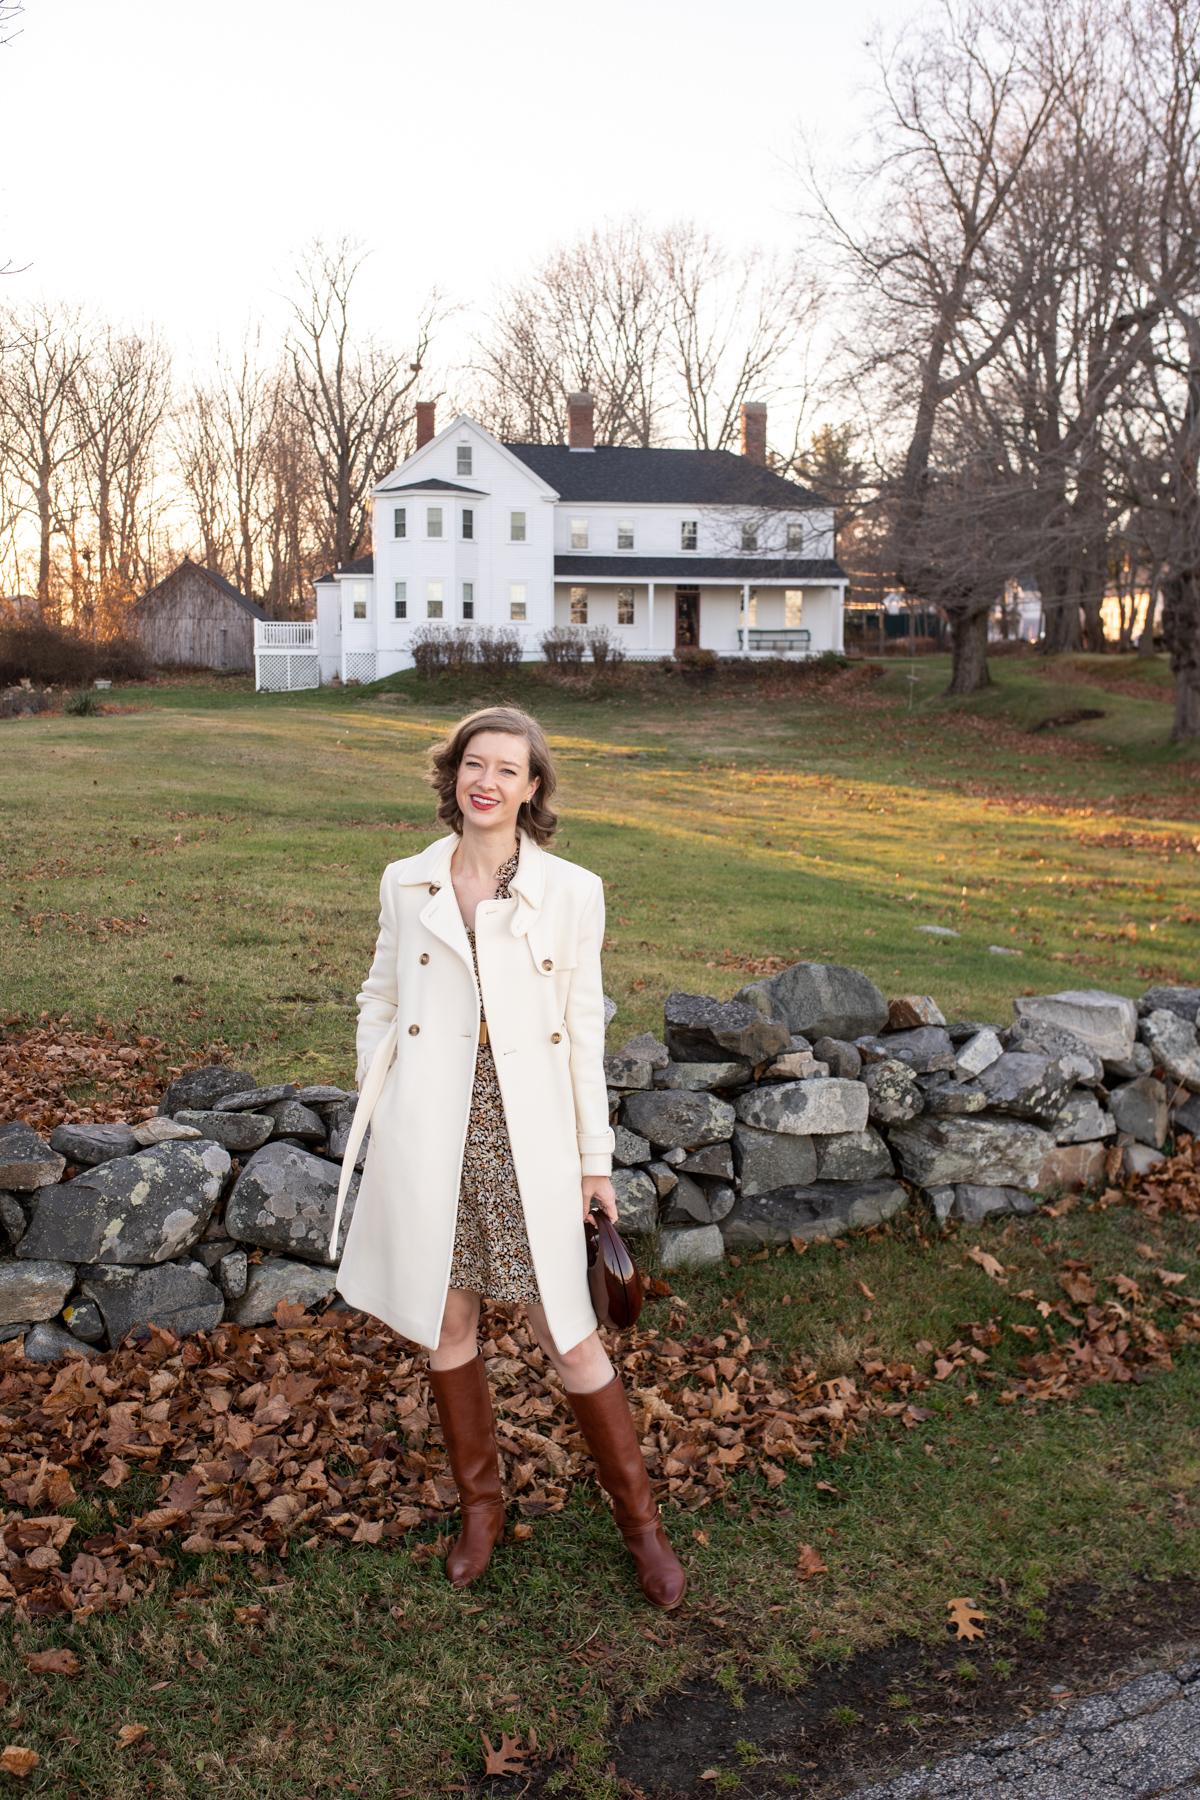 Stacie Flinner x Charlotte Brody Smocked Winterberry Dress-1.jpg